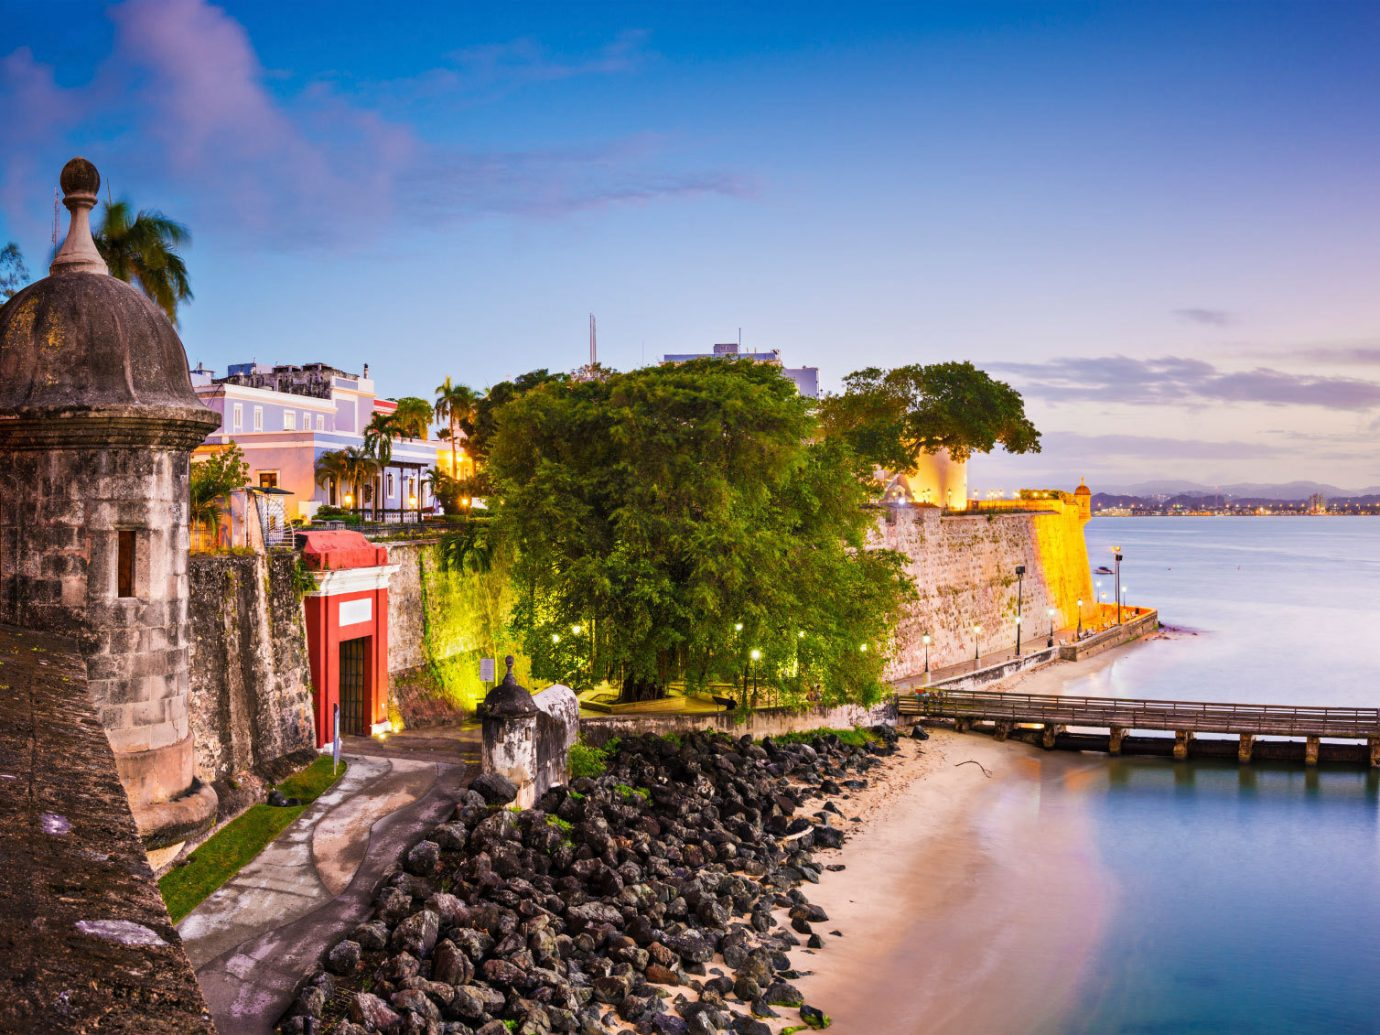 San Juan, Puerto Rico at night